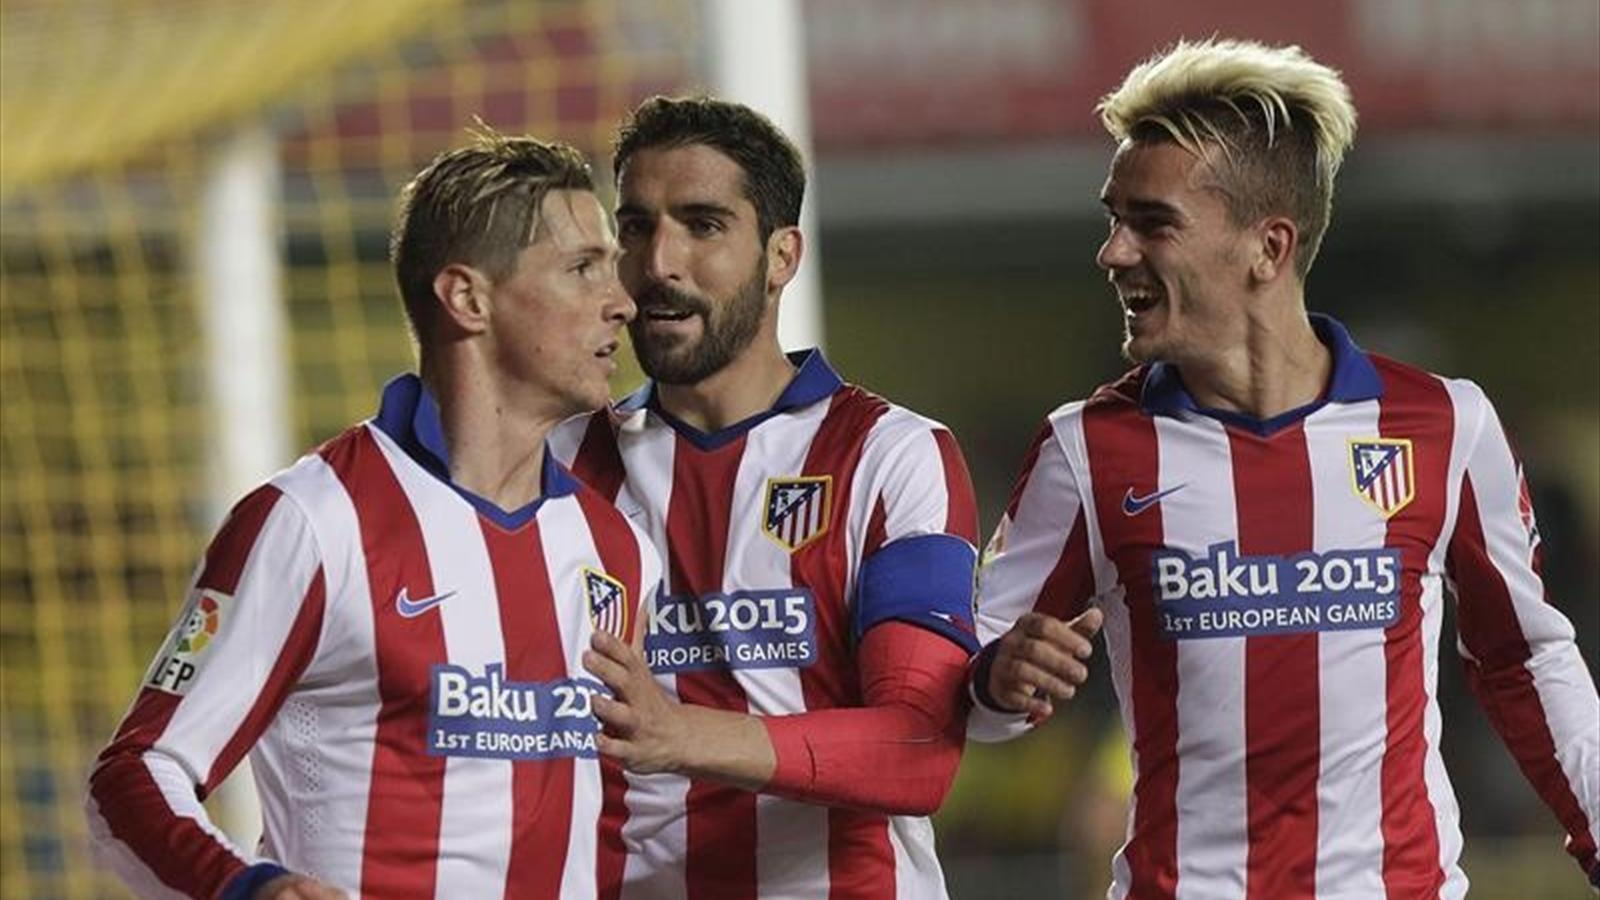 Fernando Torres, Raúl García and Antoine Griezmann